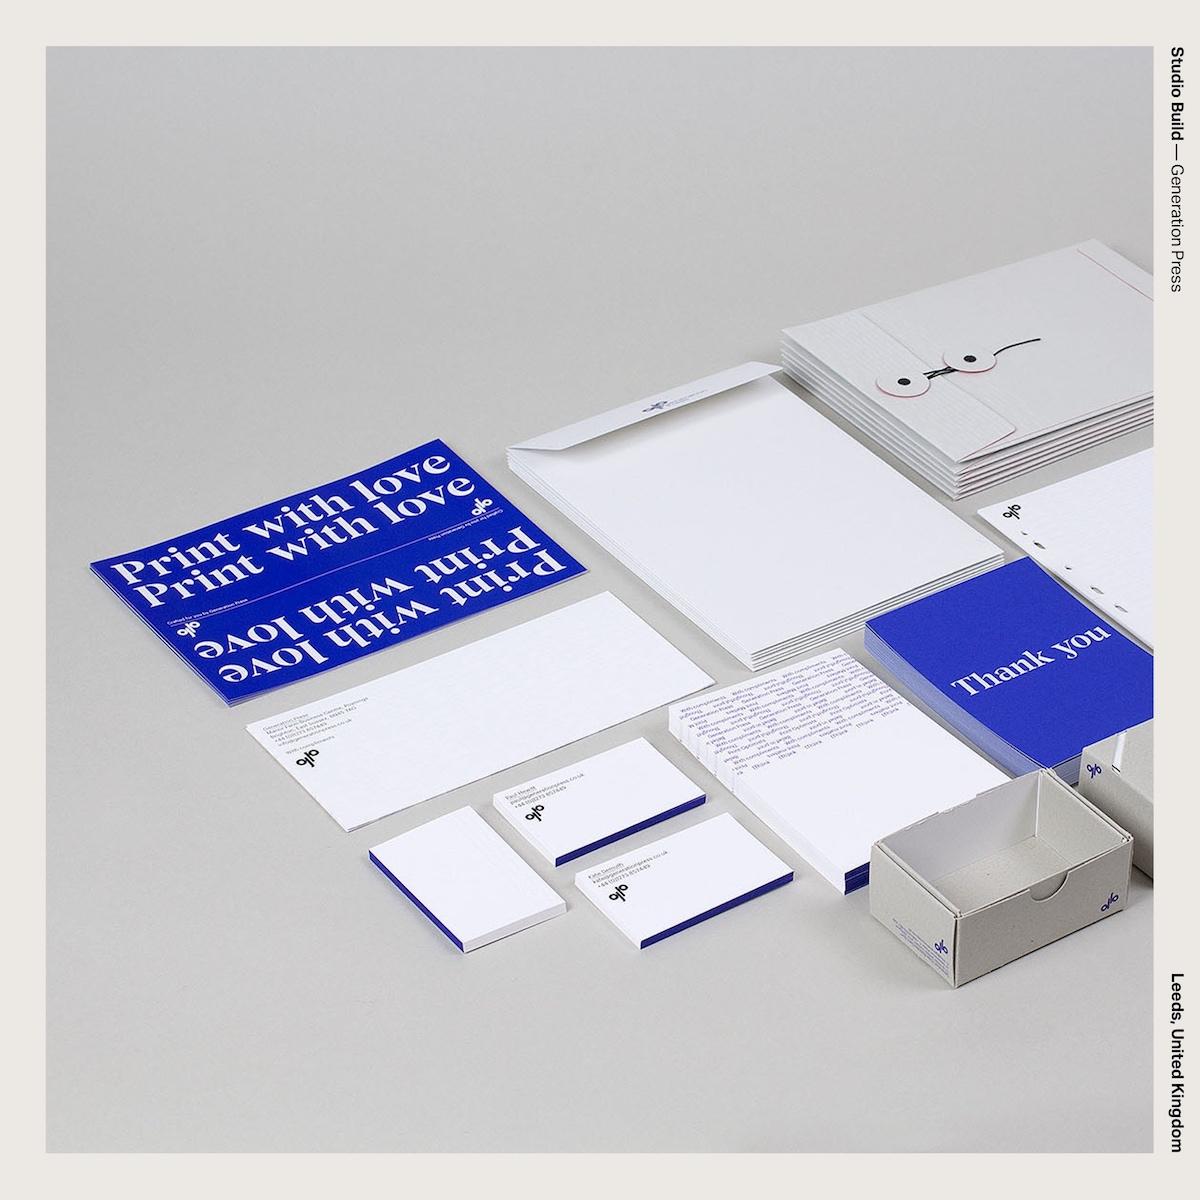 Studio Build — Generation Press